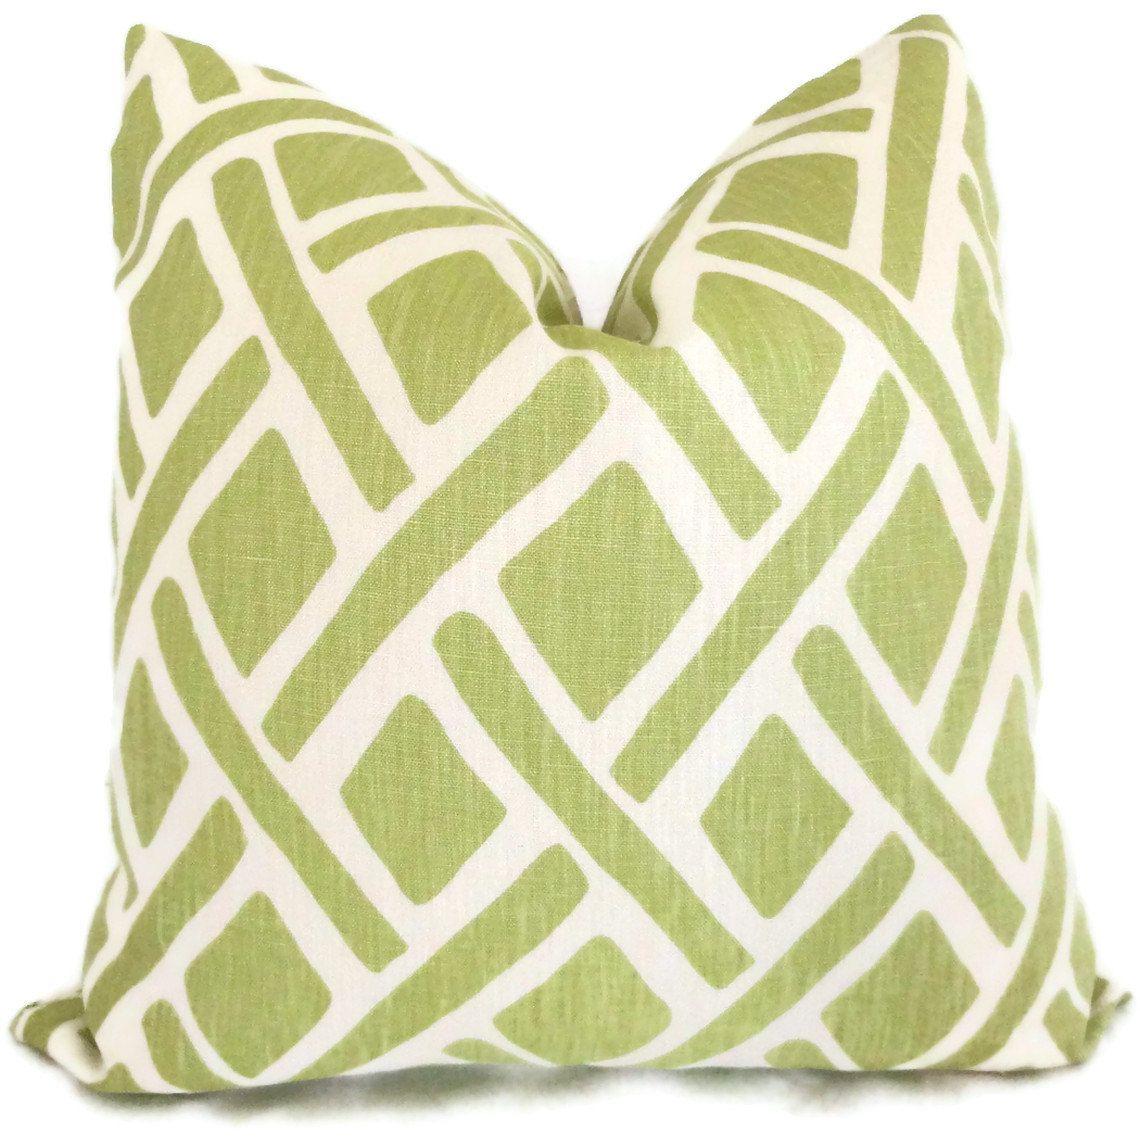 Kravet Green Trellis Decorative Pillow Cover 17x17, 17x17, 17x17 ...